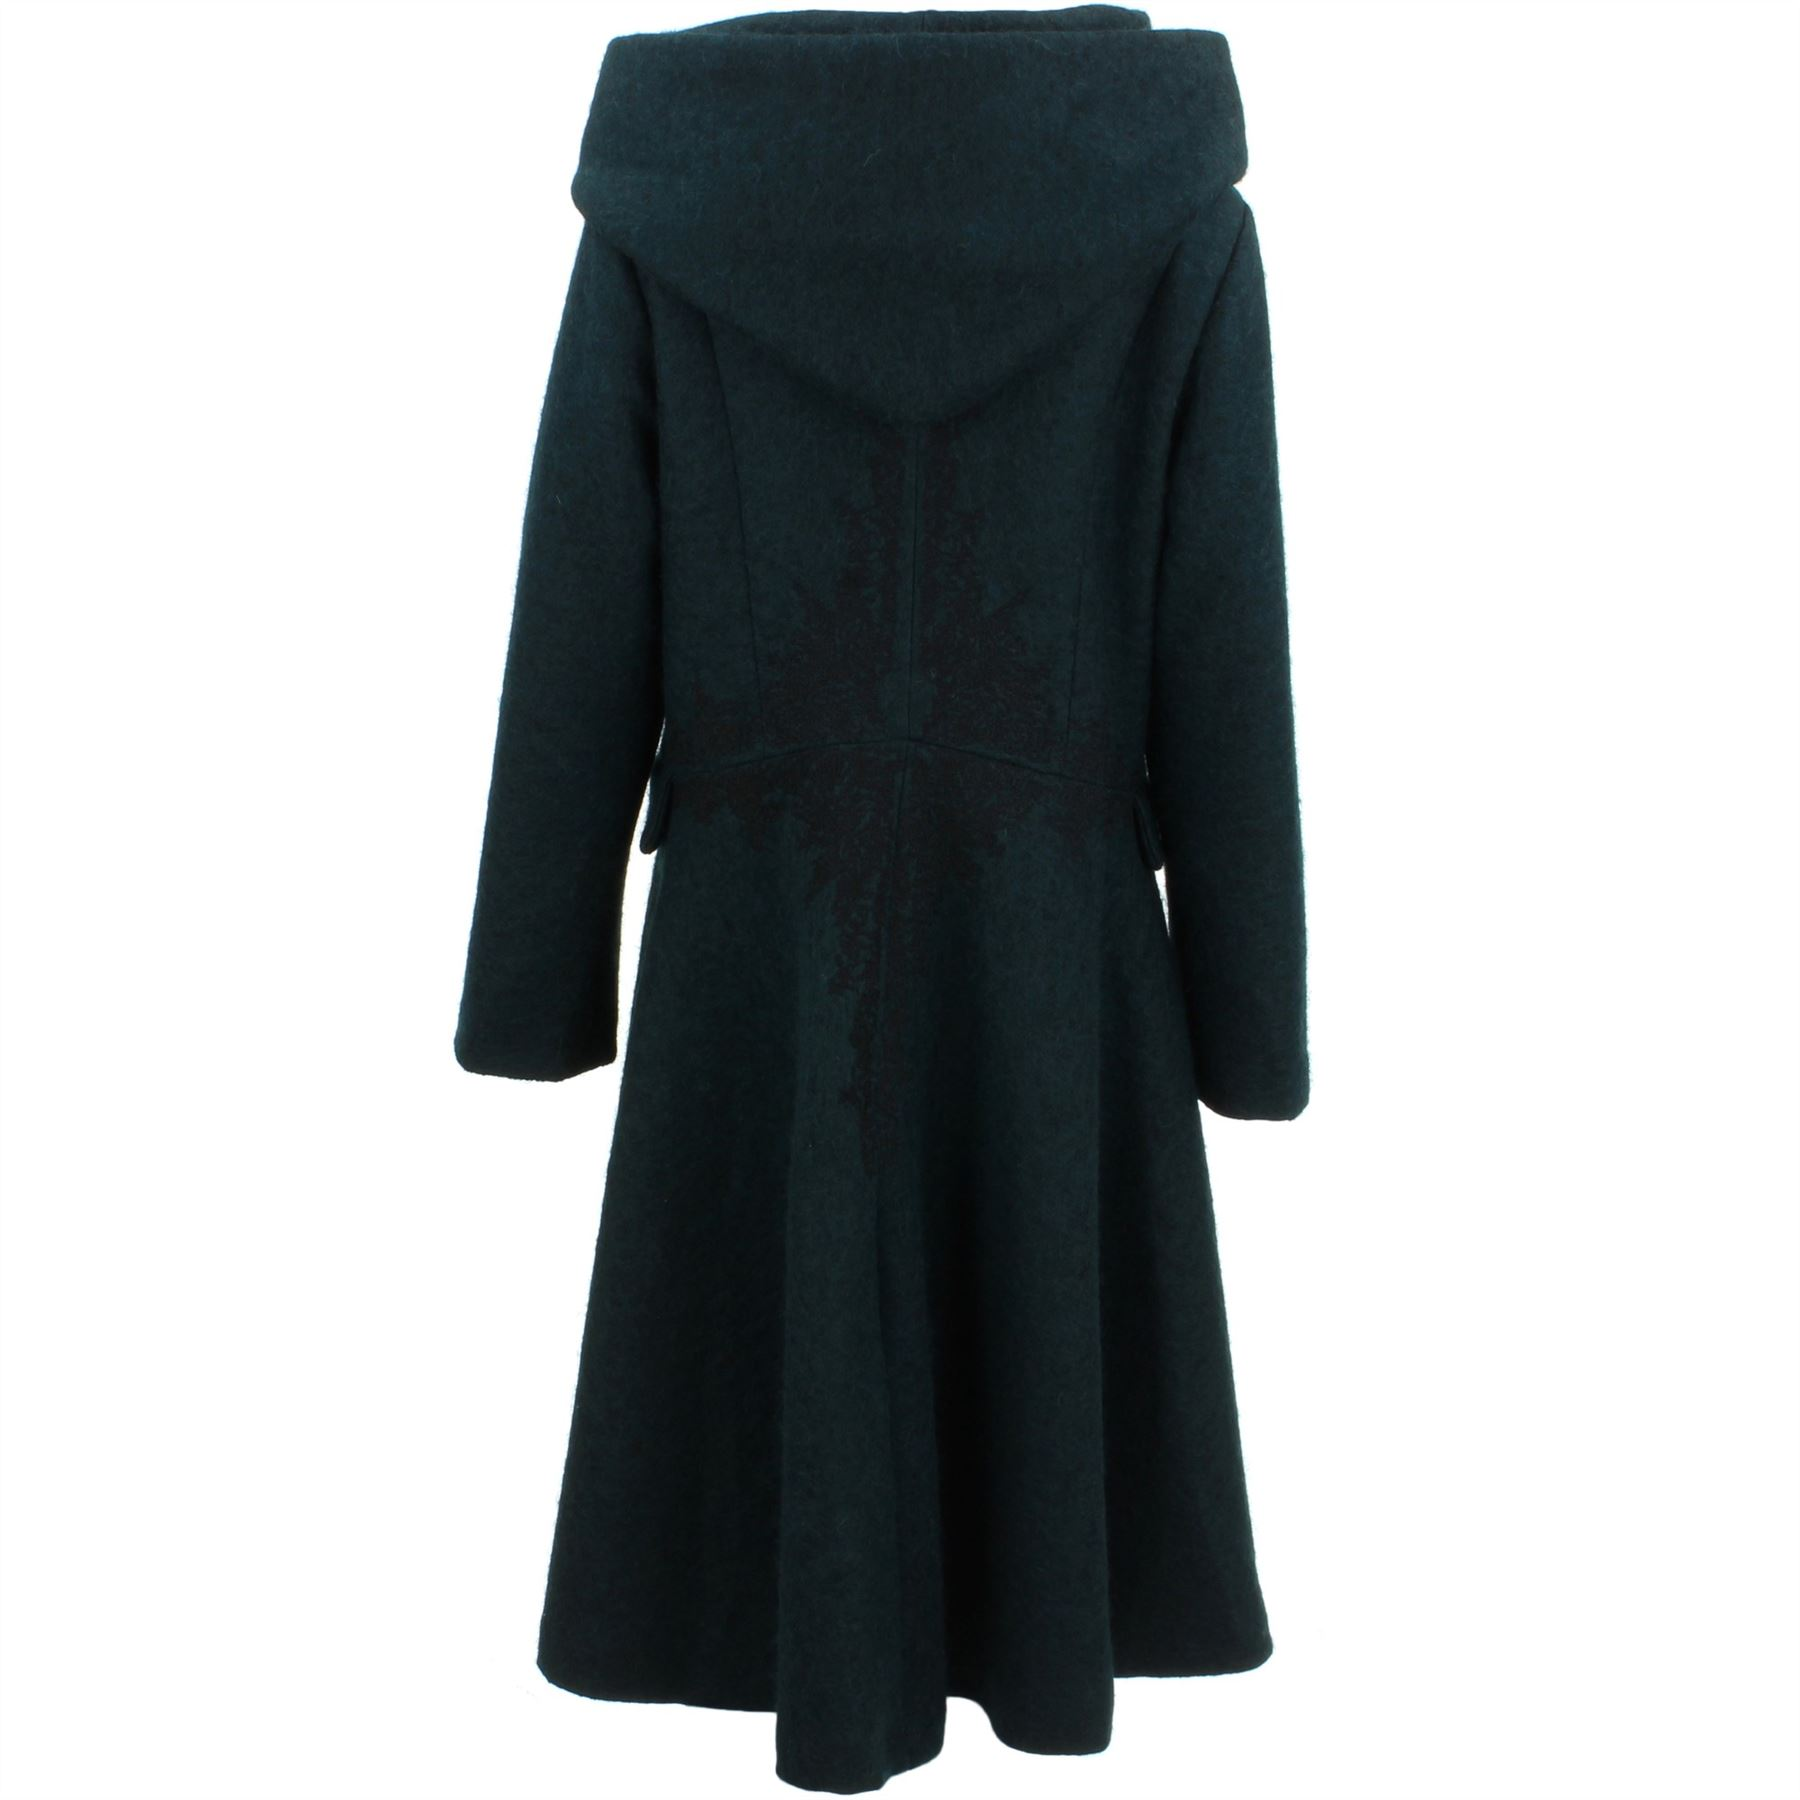 Ladies-Wool-Winter-Coat-Jacket-BOHEMIA-SWEDEN-Woven-Wool-rich-blend-Hood thumbnail 11